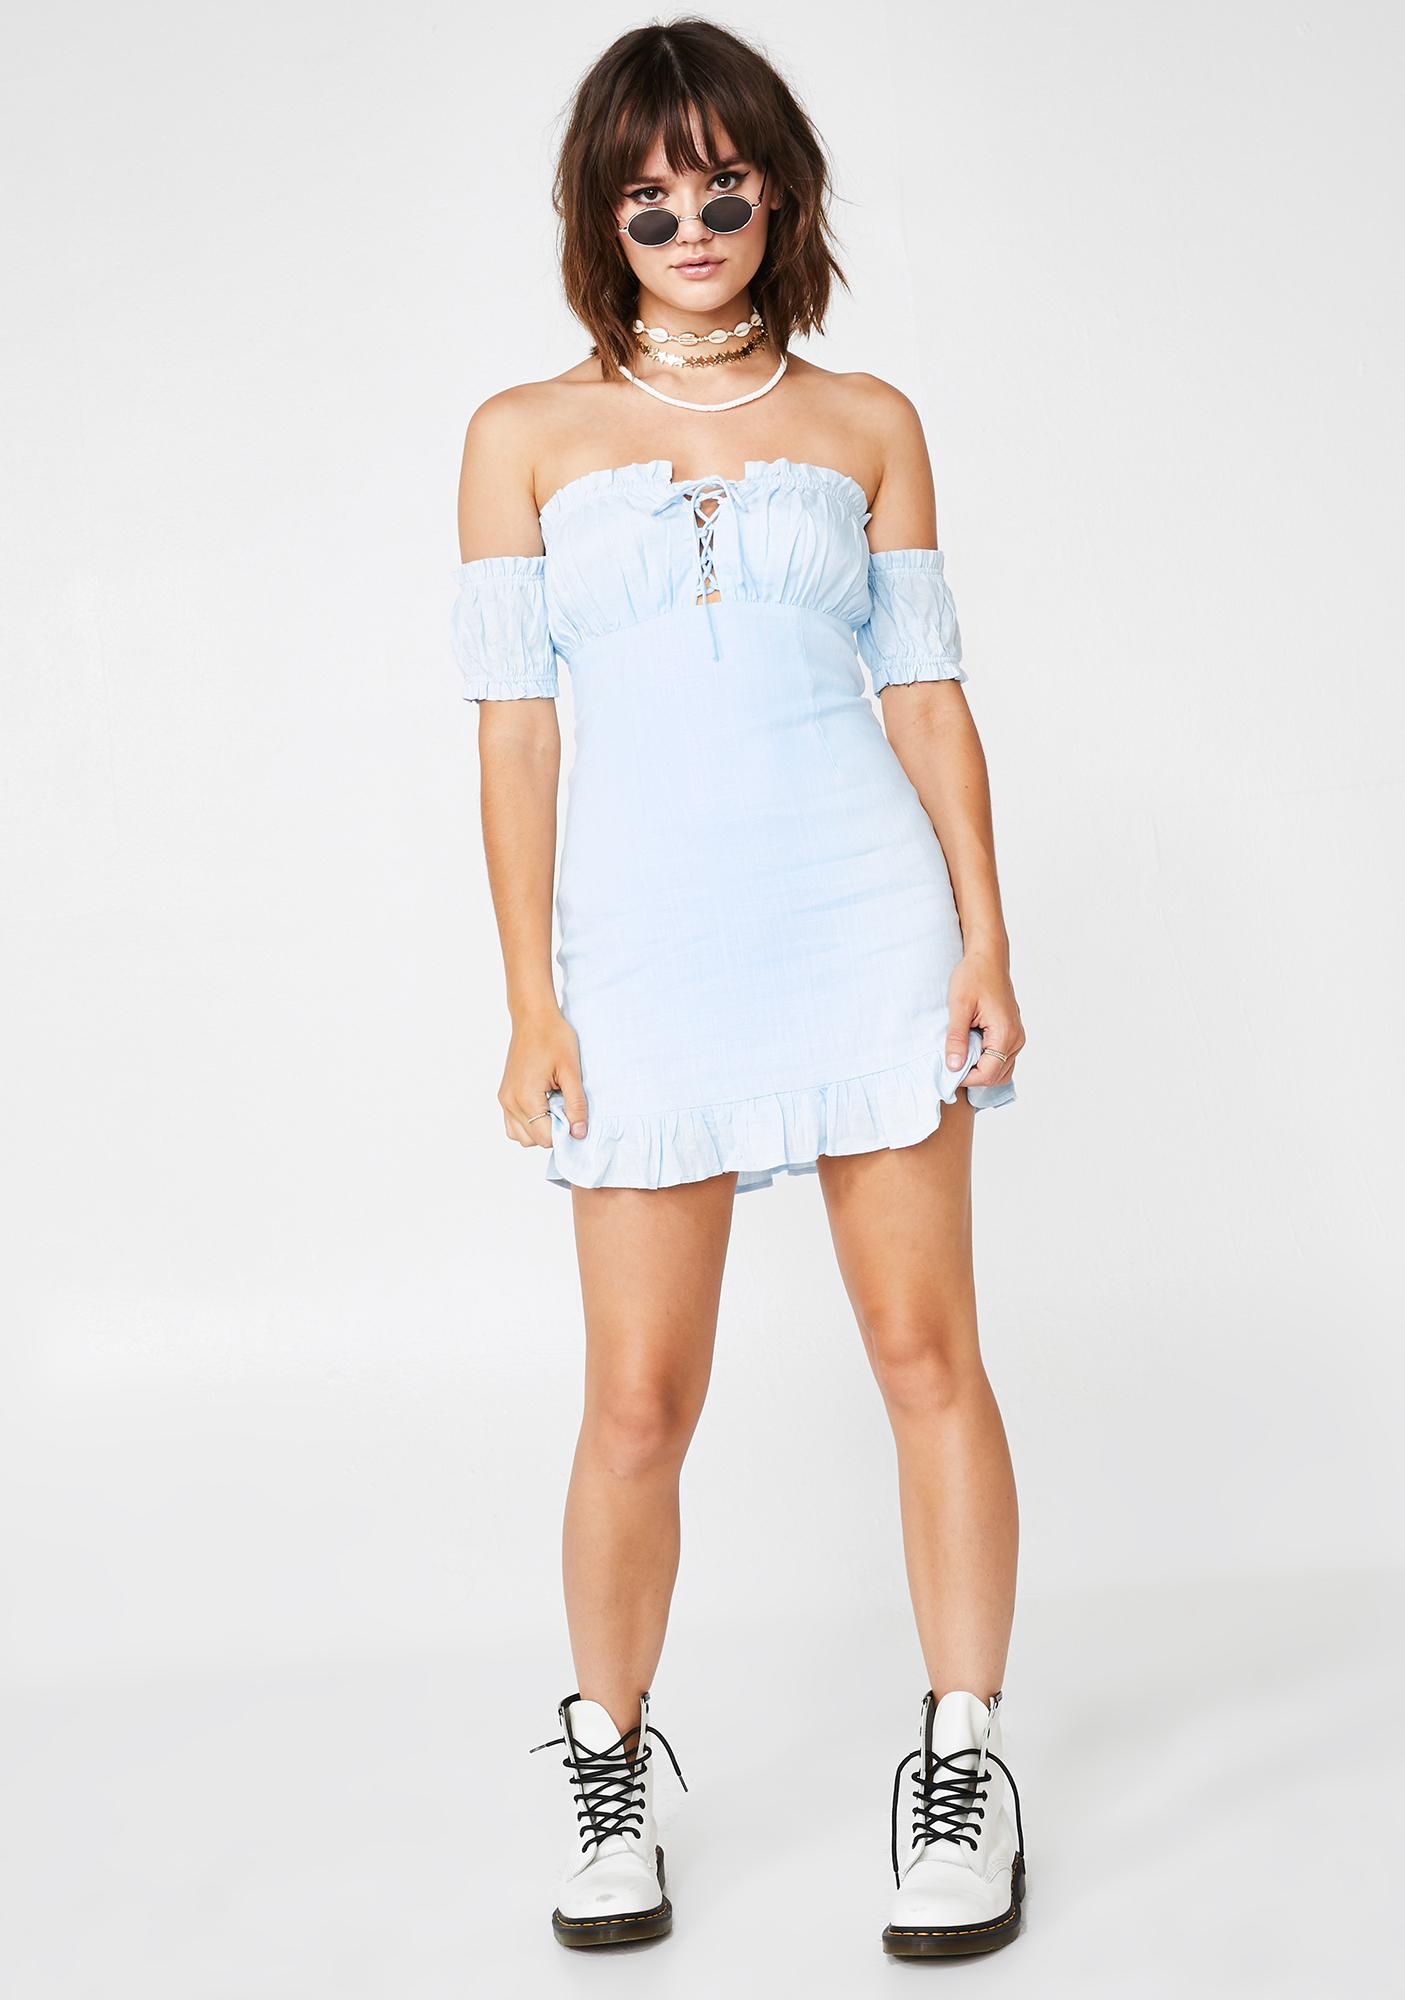 Bluebelle Lace-Up Sundress